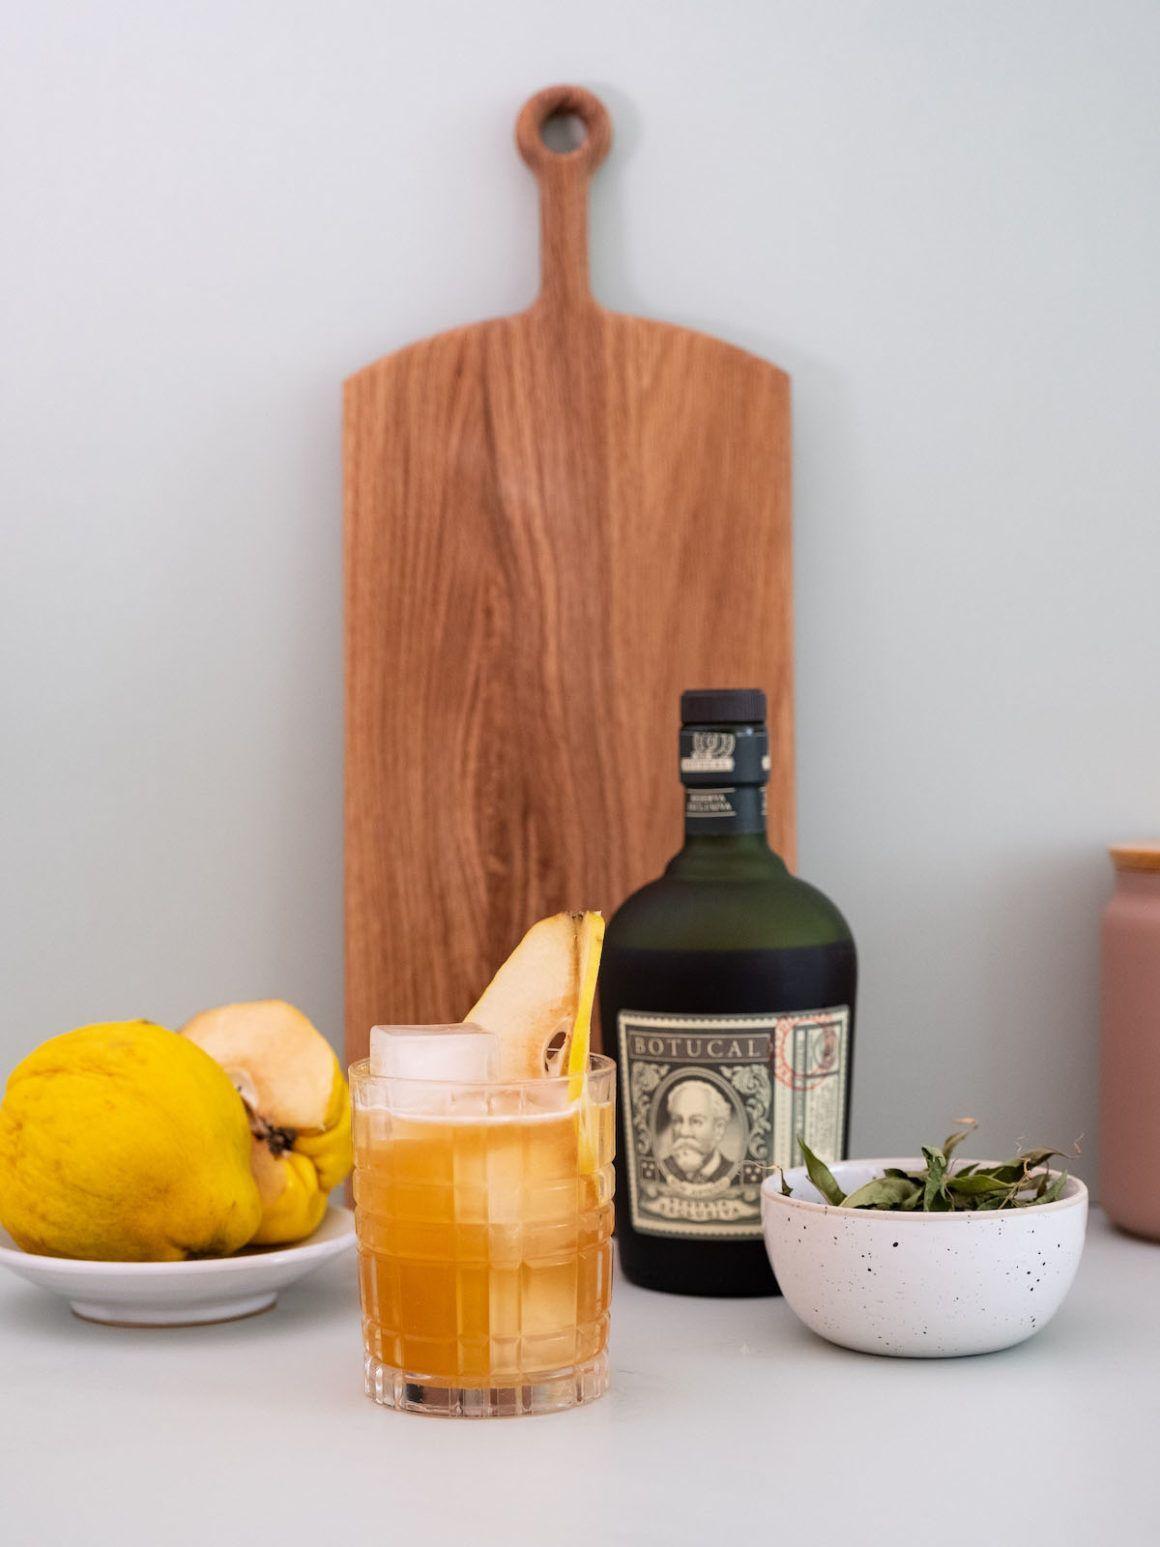 Foodblog, Drink, Botucal, Verbene, Zitrone, Quitte, Sour